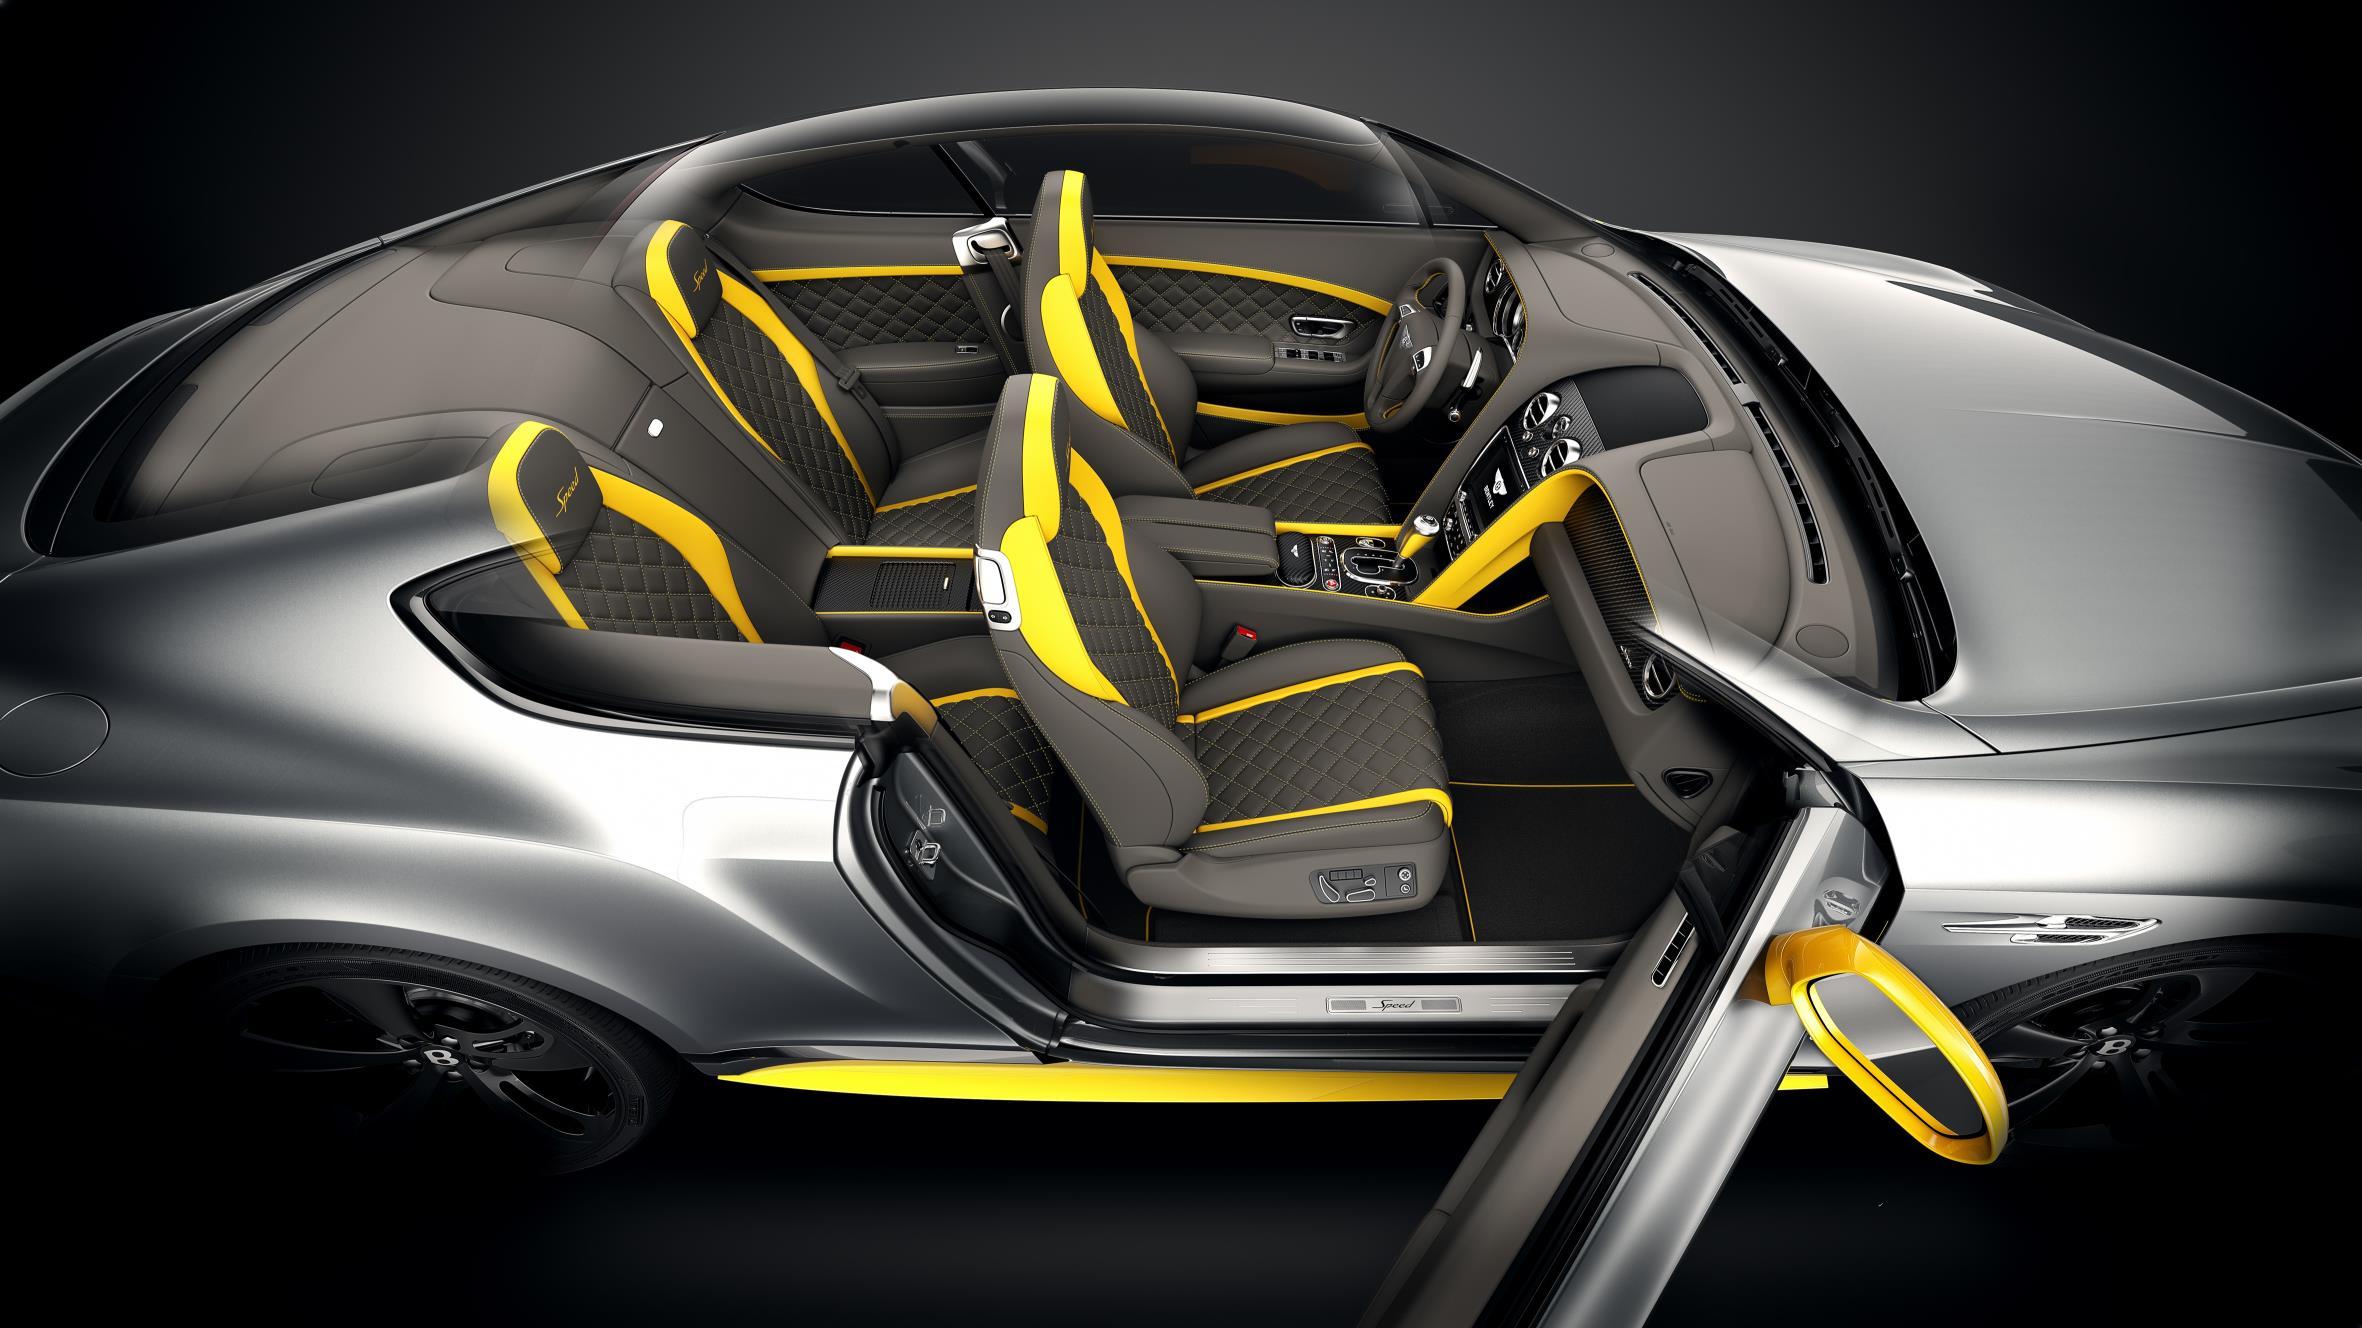 Discover the future of cars and transportation technology via @carsfera www.carsfera.com #cars #autoshow #conceptcars #conceptvehicles #bestcarstobuy #showroom #testdrive #safecar #safestcars #cars2017 #cars2018 #cars2016 #2017Mazda#Drivingmatters#MazdaRoaster#MazdaMX5#Worldbestcardesign#NYIAS2016#Lexus_V_LCRO_Technology_#McLaren570SPortimao#FormulaE#Robocar#GTSpeedBlackEditionCoupeBentley